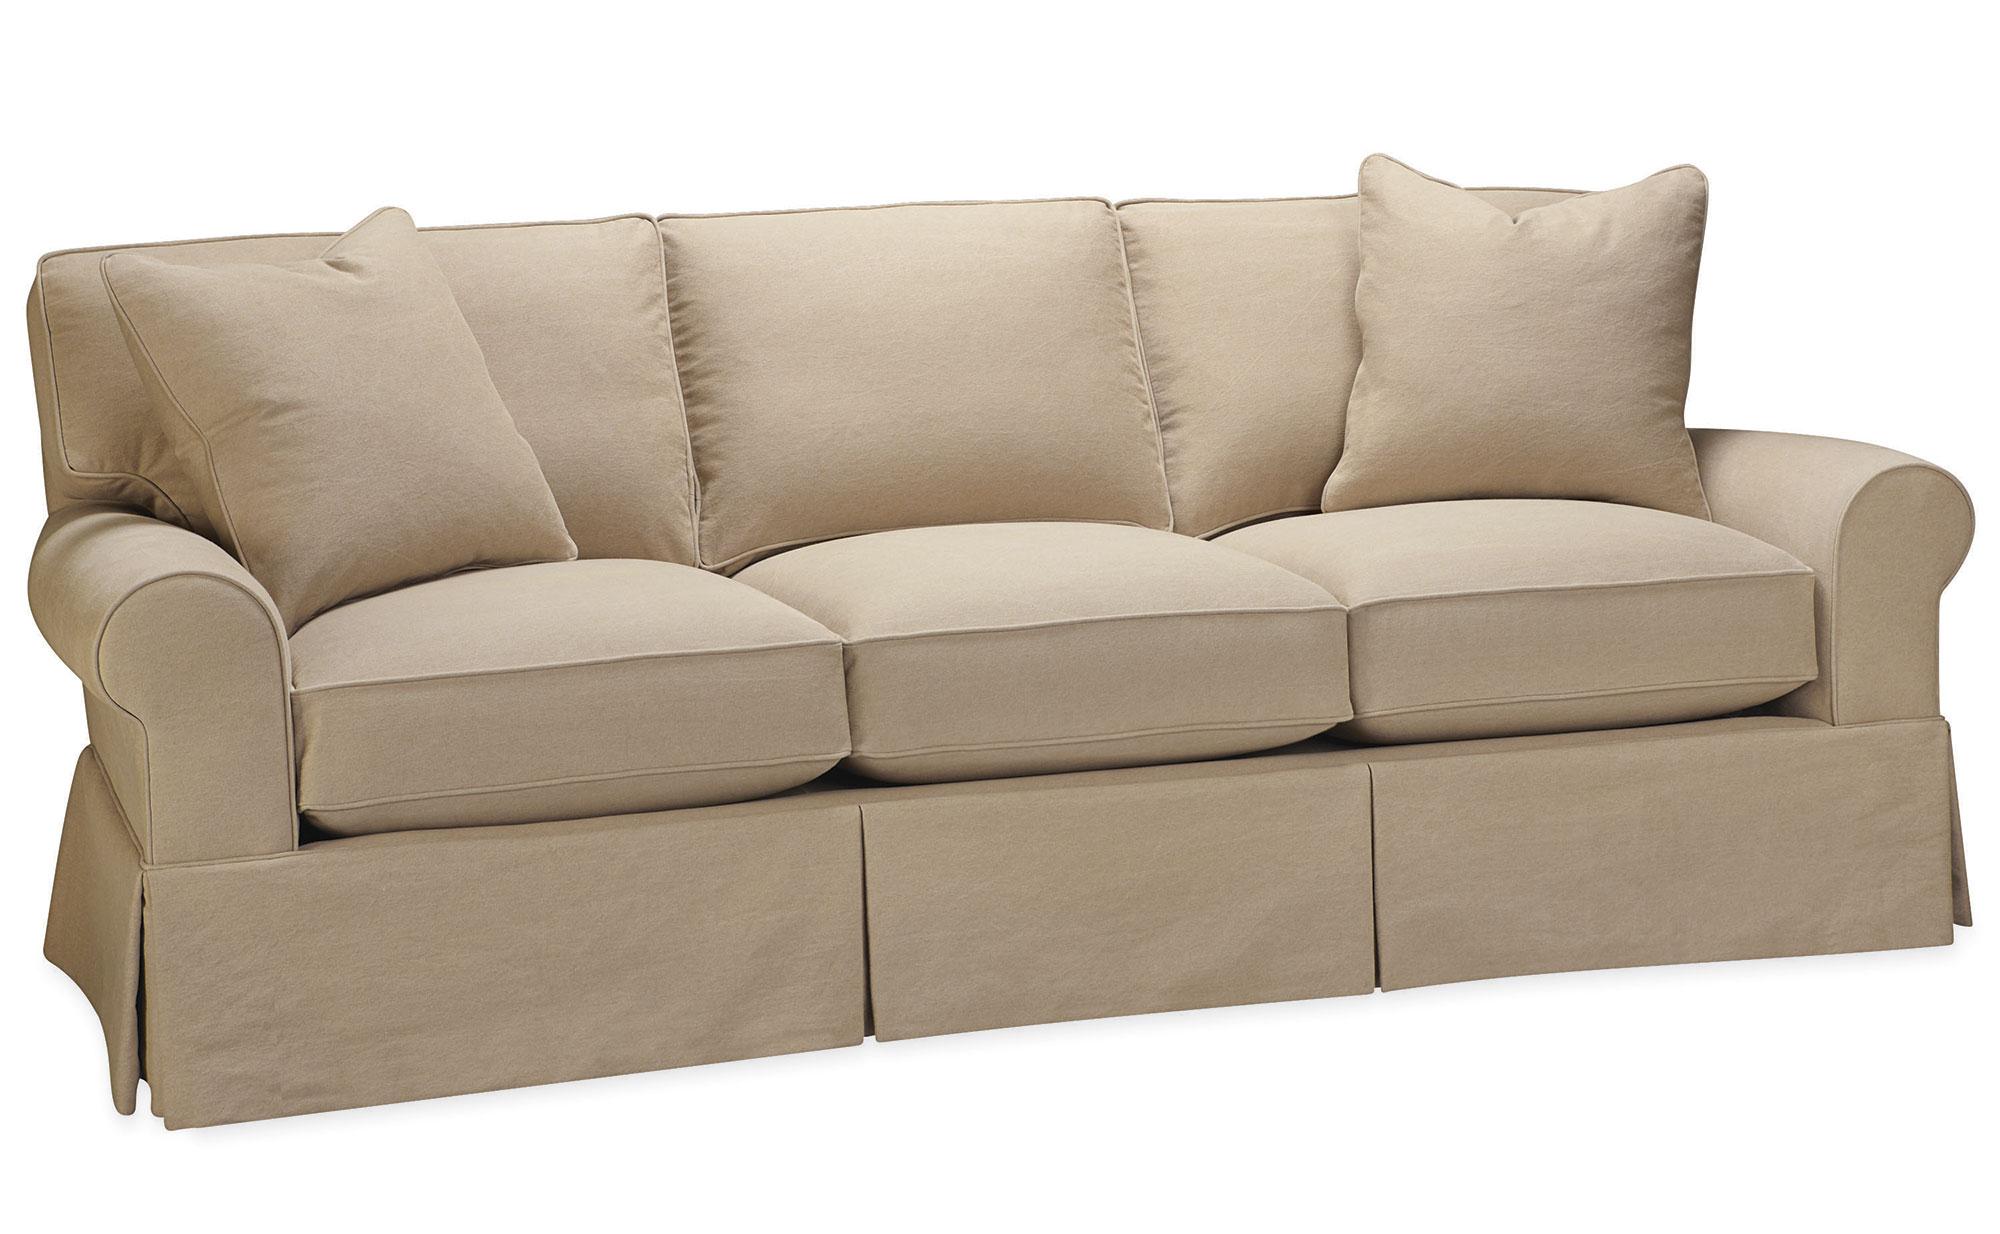 lee slipcovered sofa reviews living es bed sleeper furniture custom sectional